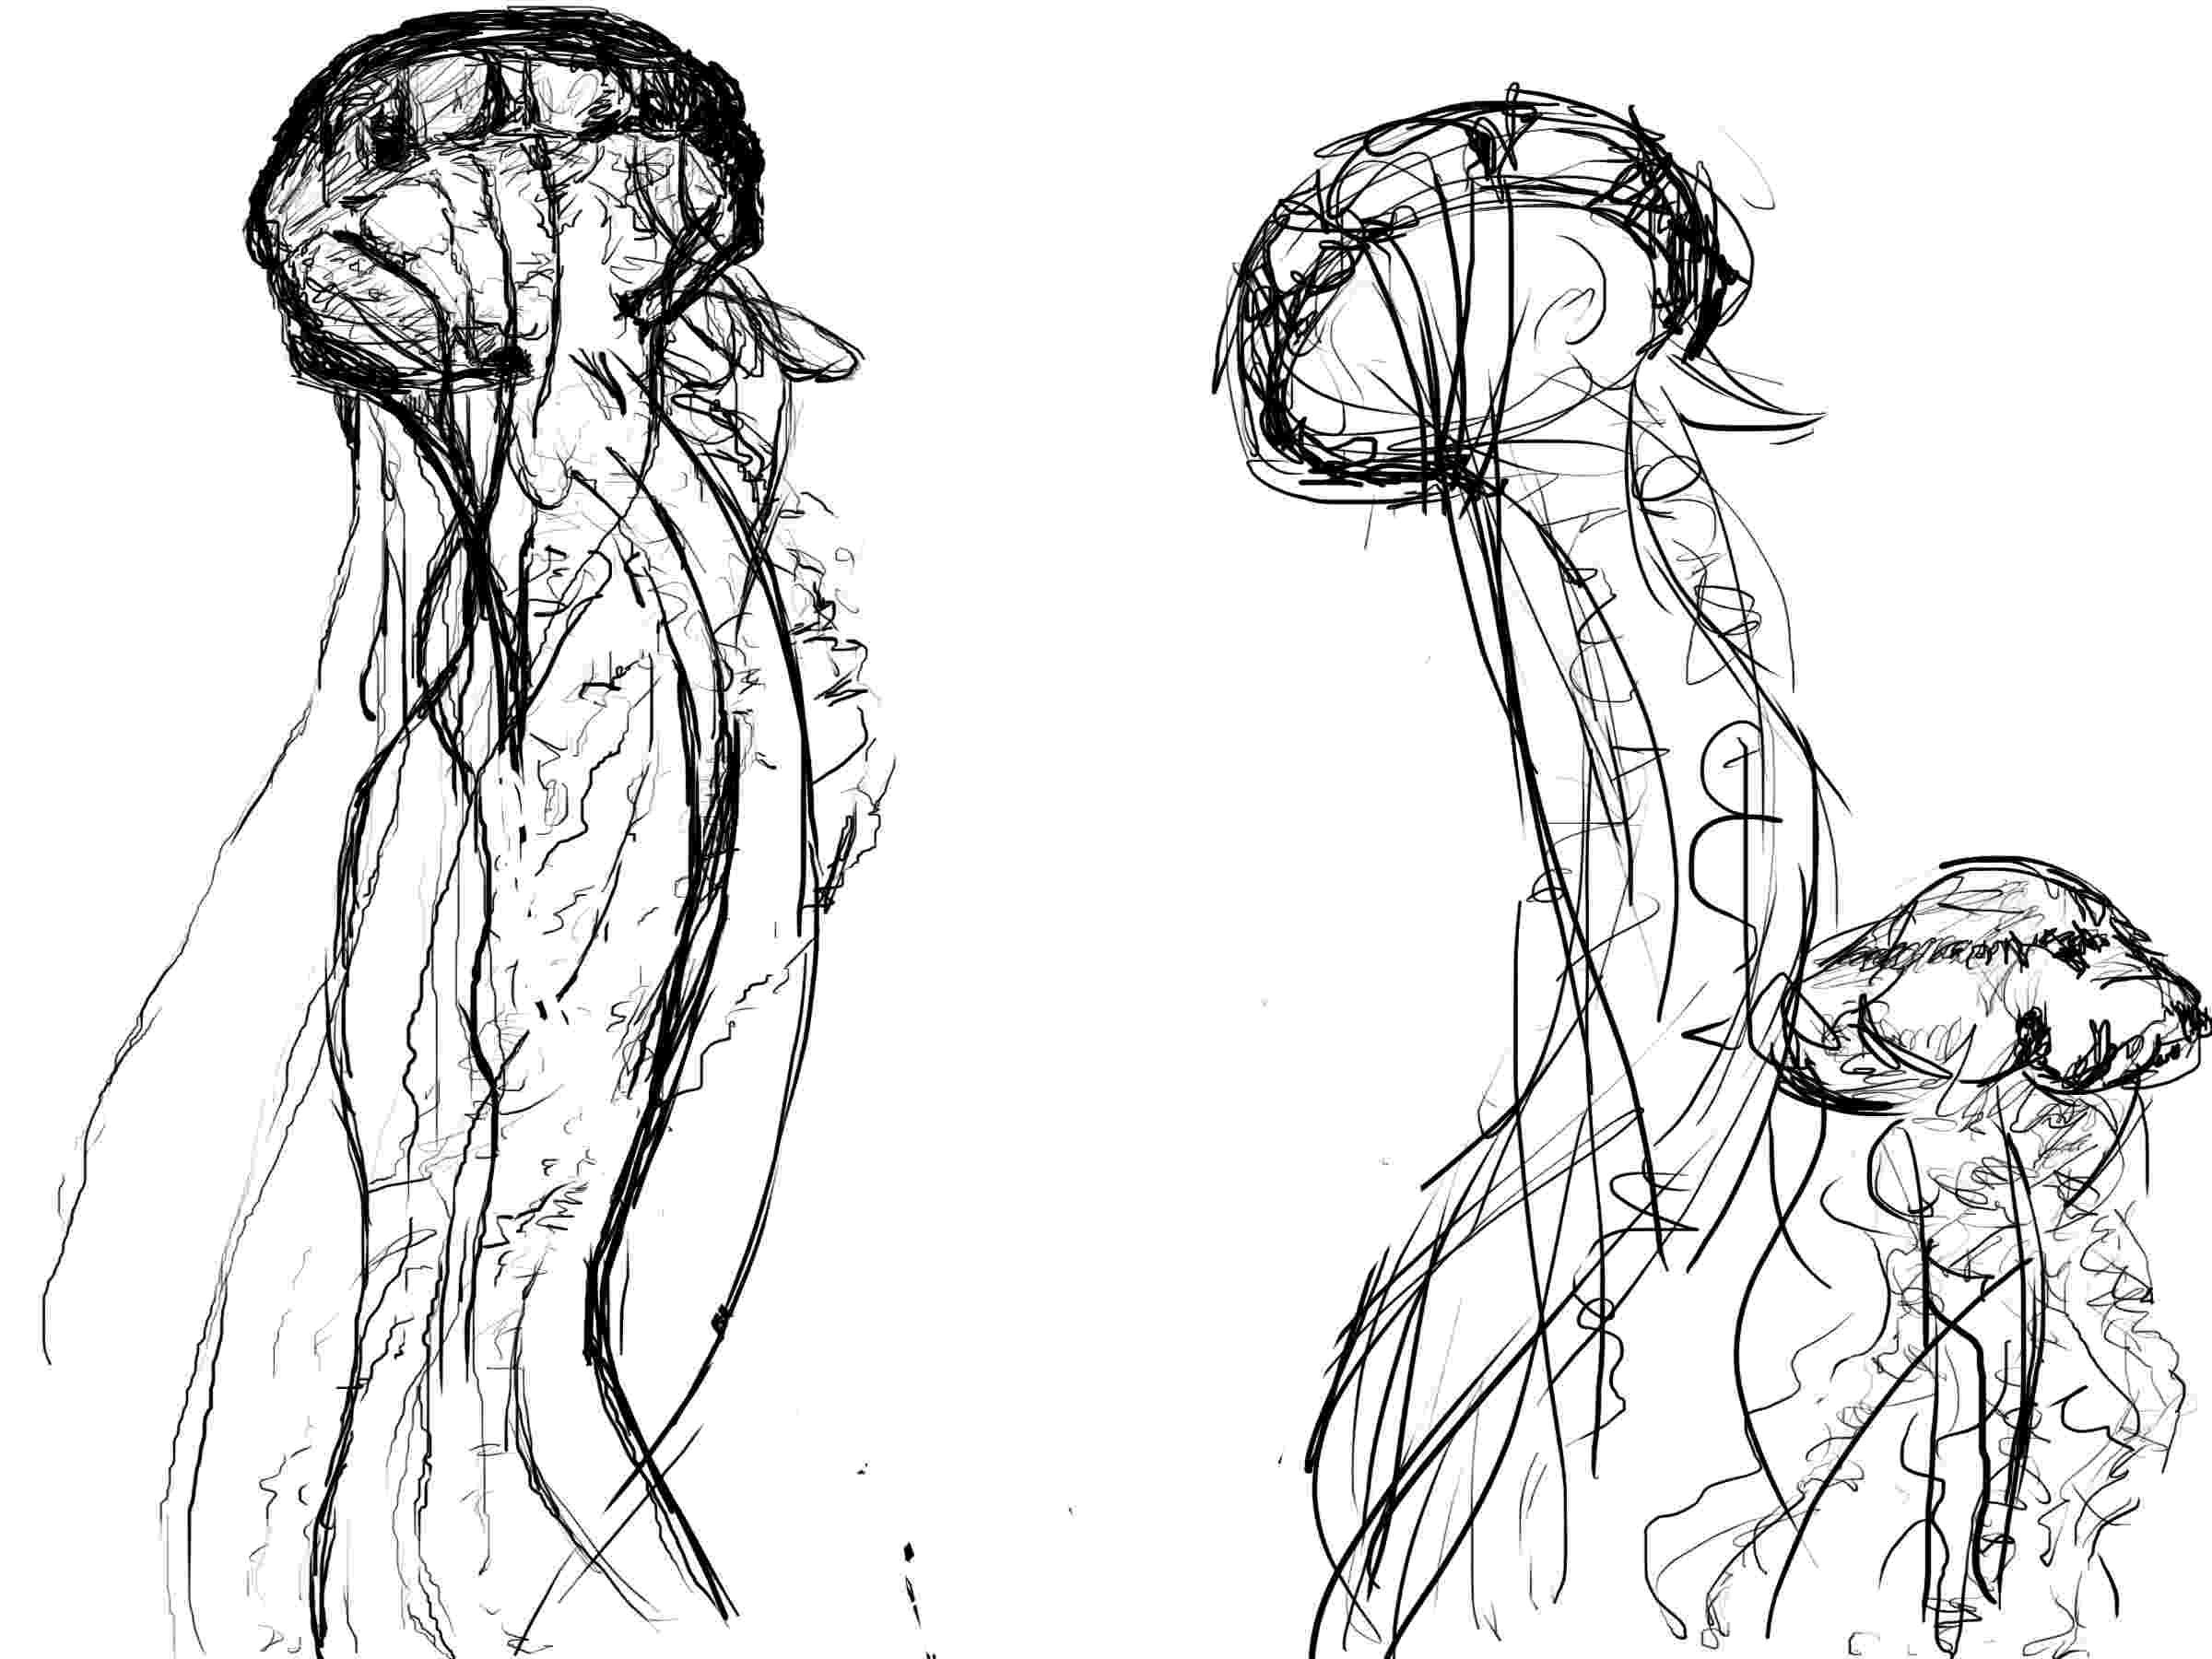 jellyfish sketch jellyfish drawing jellyfish art jellyfish tattoo jellyfish sketch